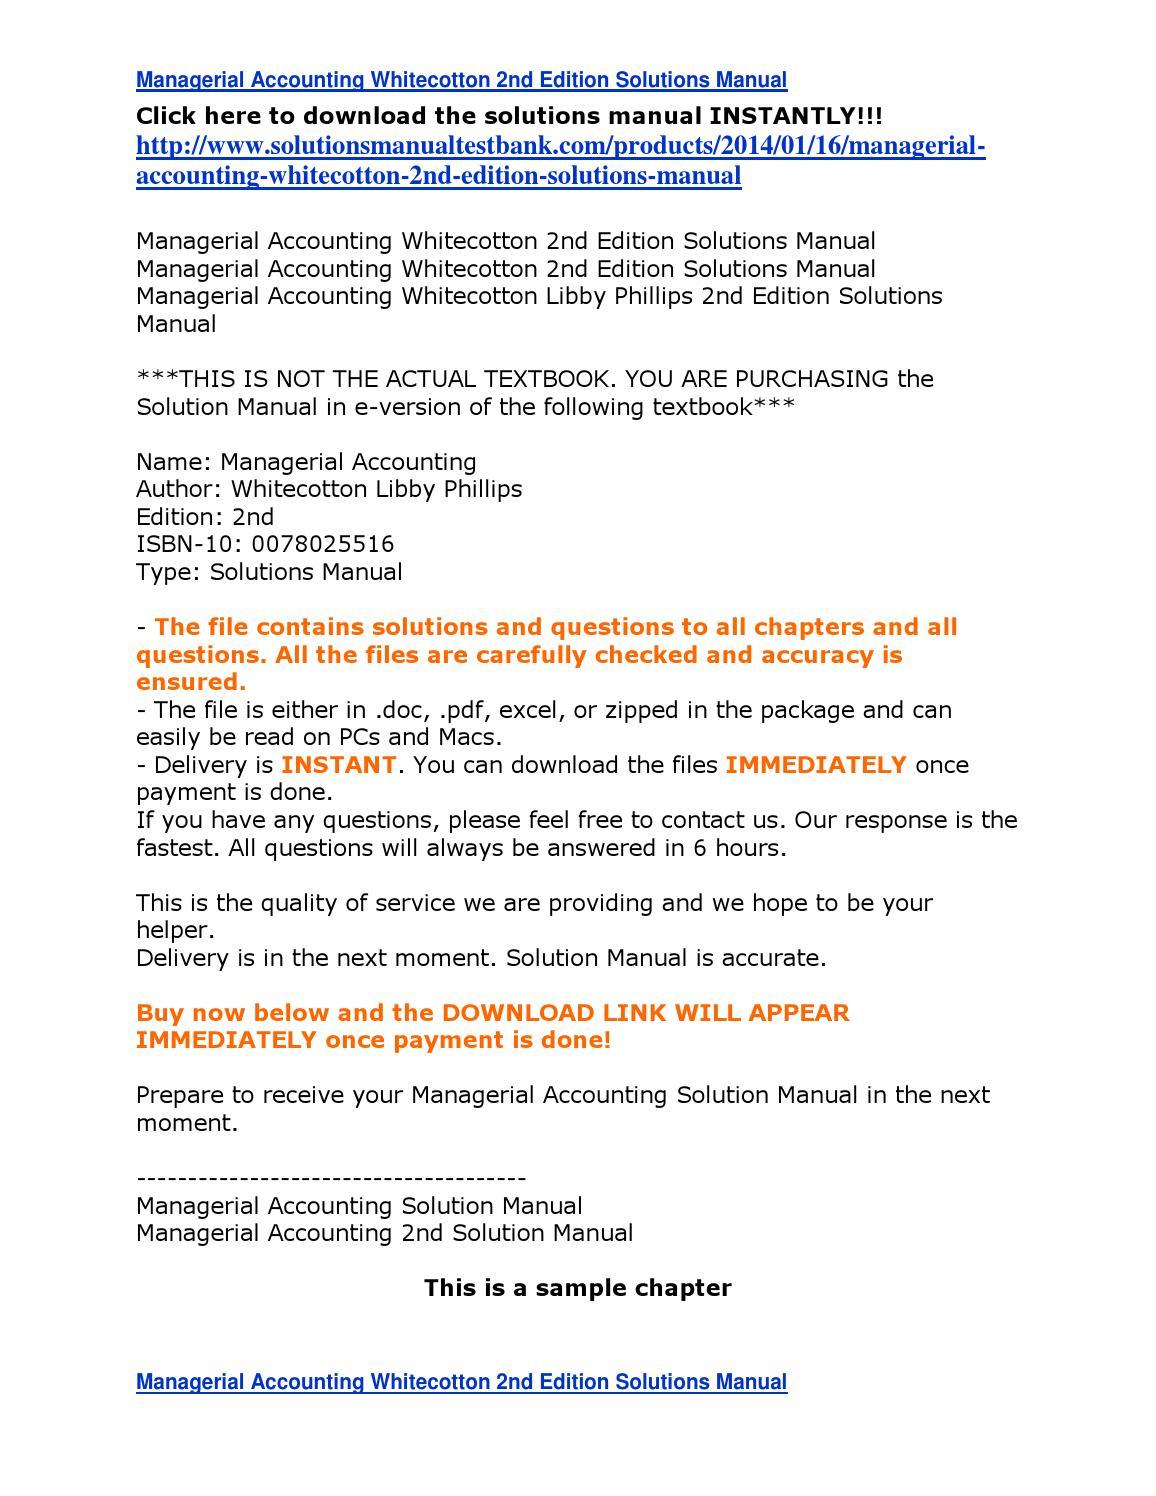 ... Process Dynamics And Control Seborg 2nd Solution Manual